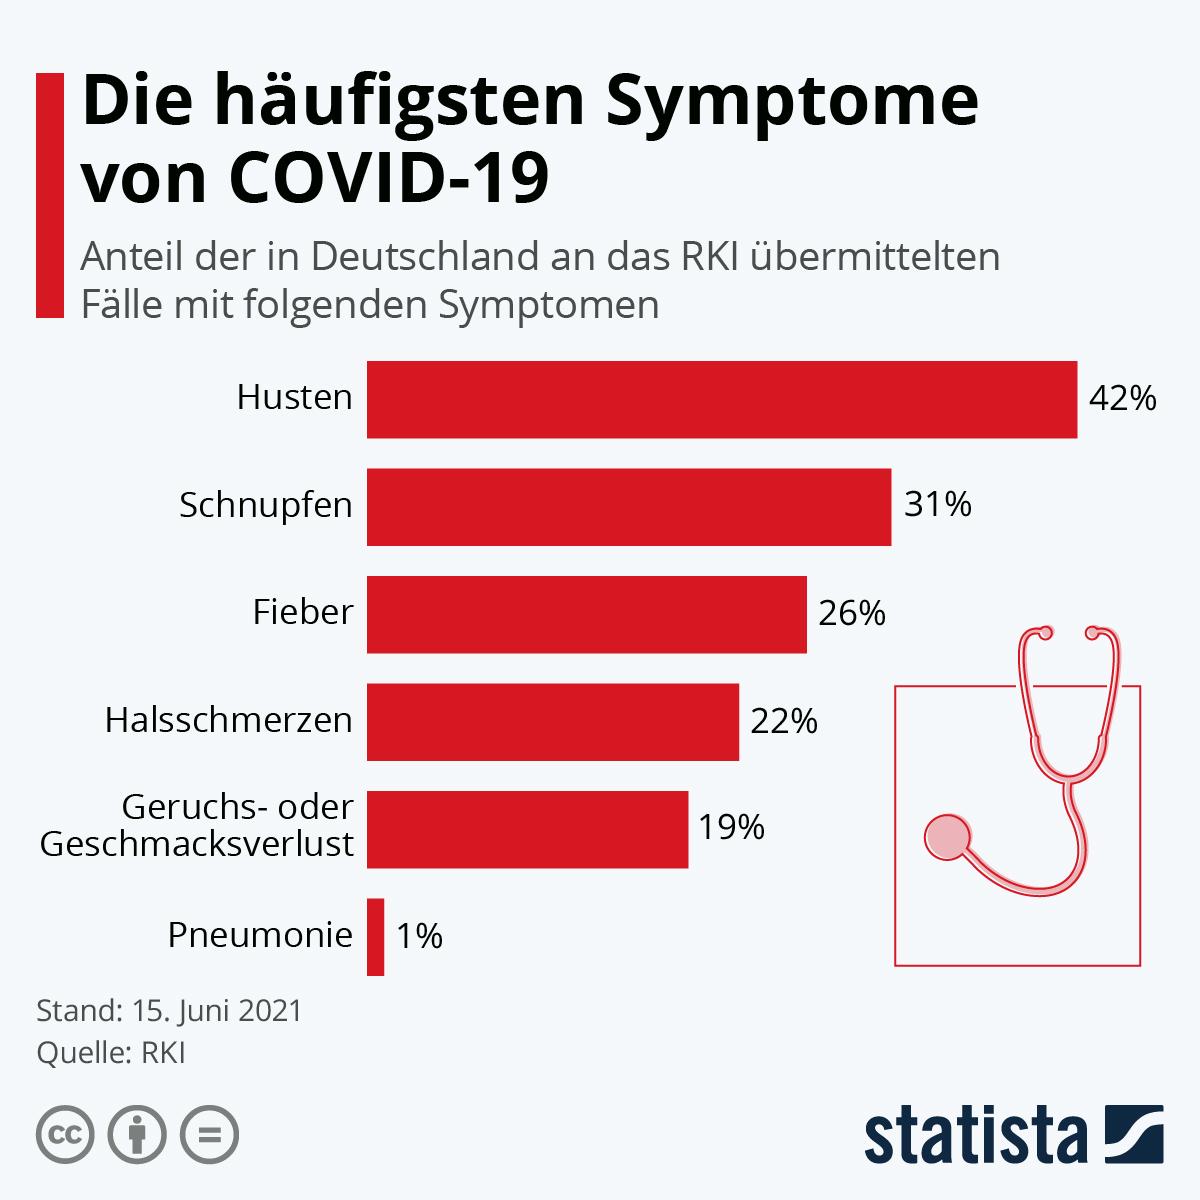 coronavirus symptome halsschmerzen